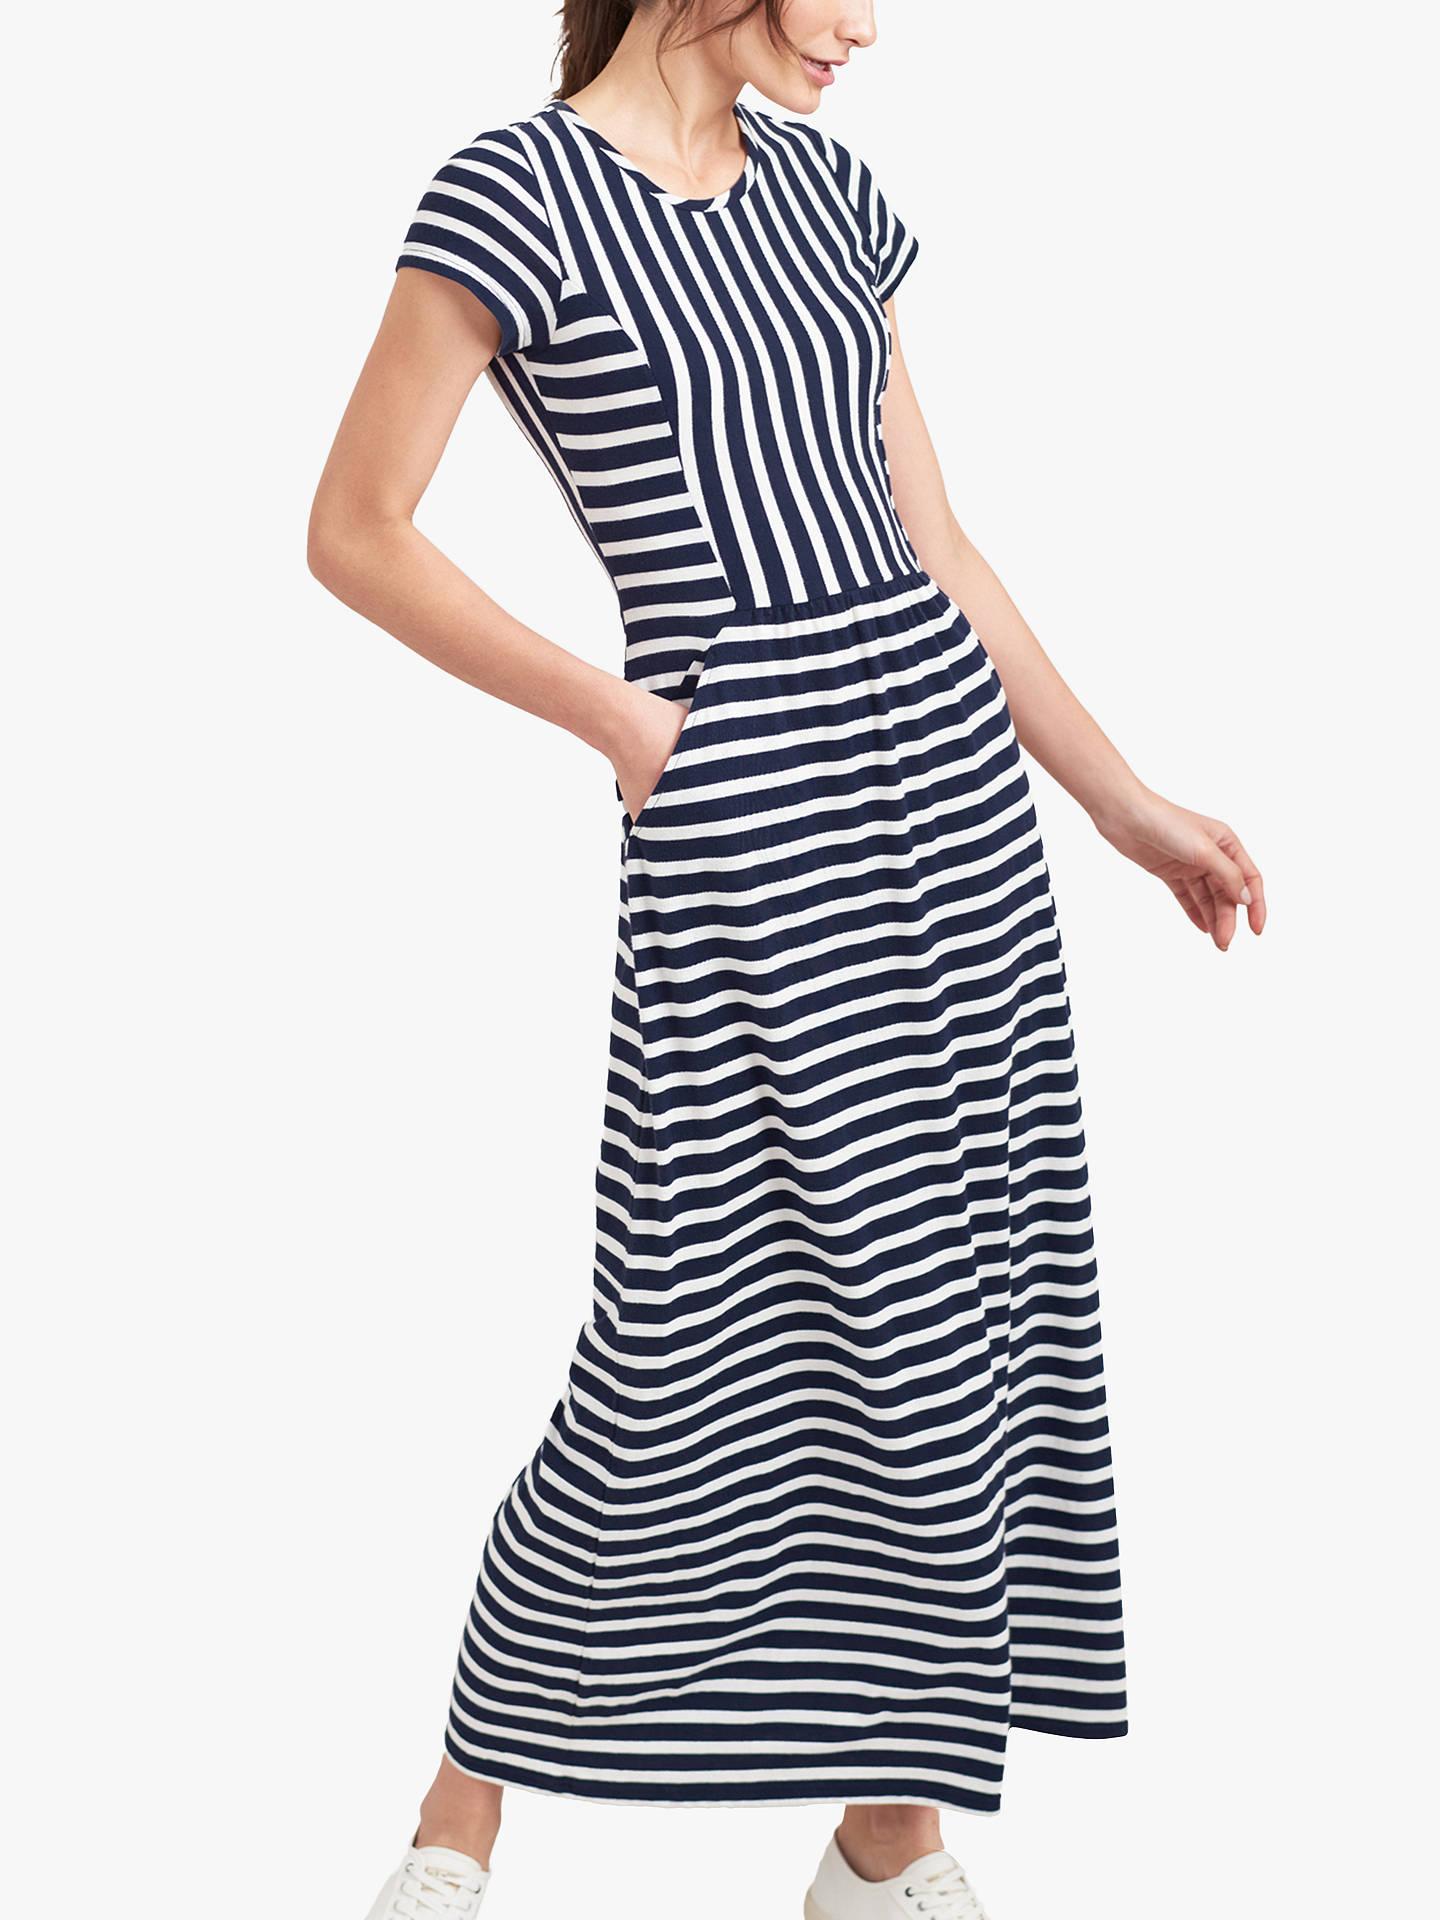 ef0286a7a88ce Joules Trudy Stripe Maxi Dress, Cream/Navy